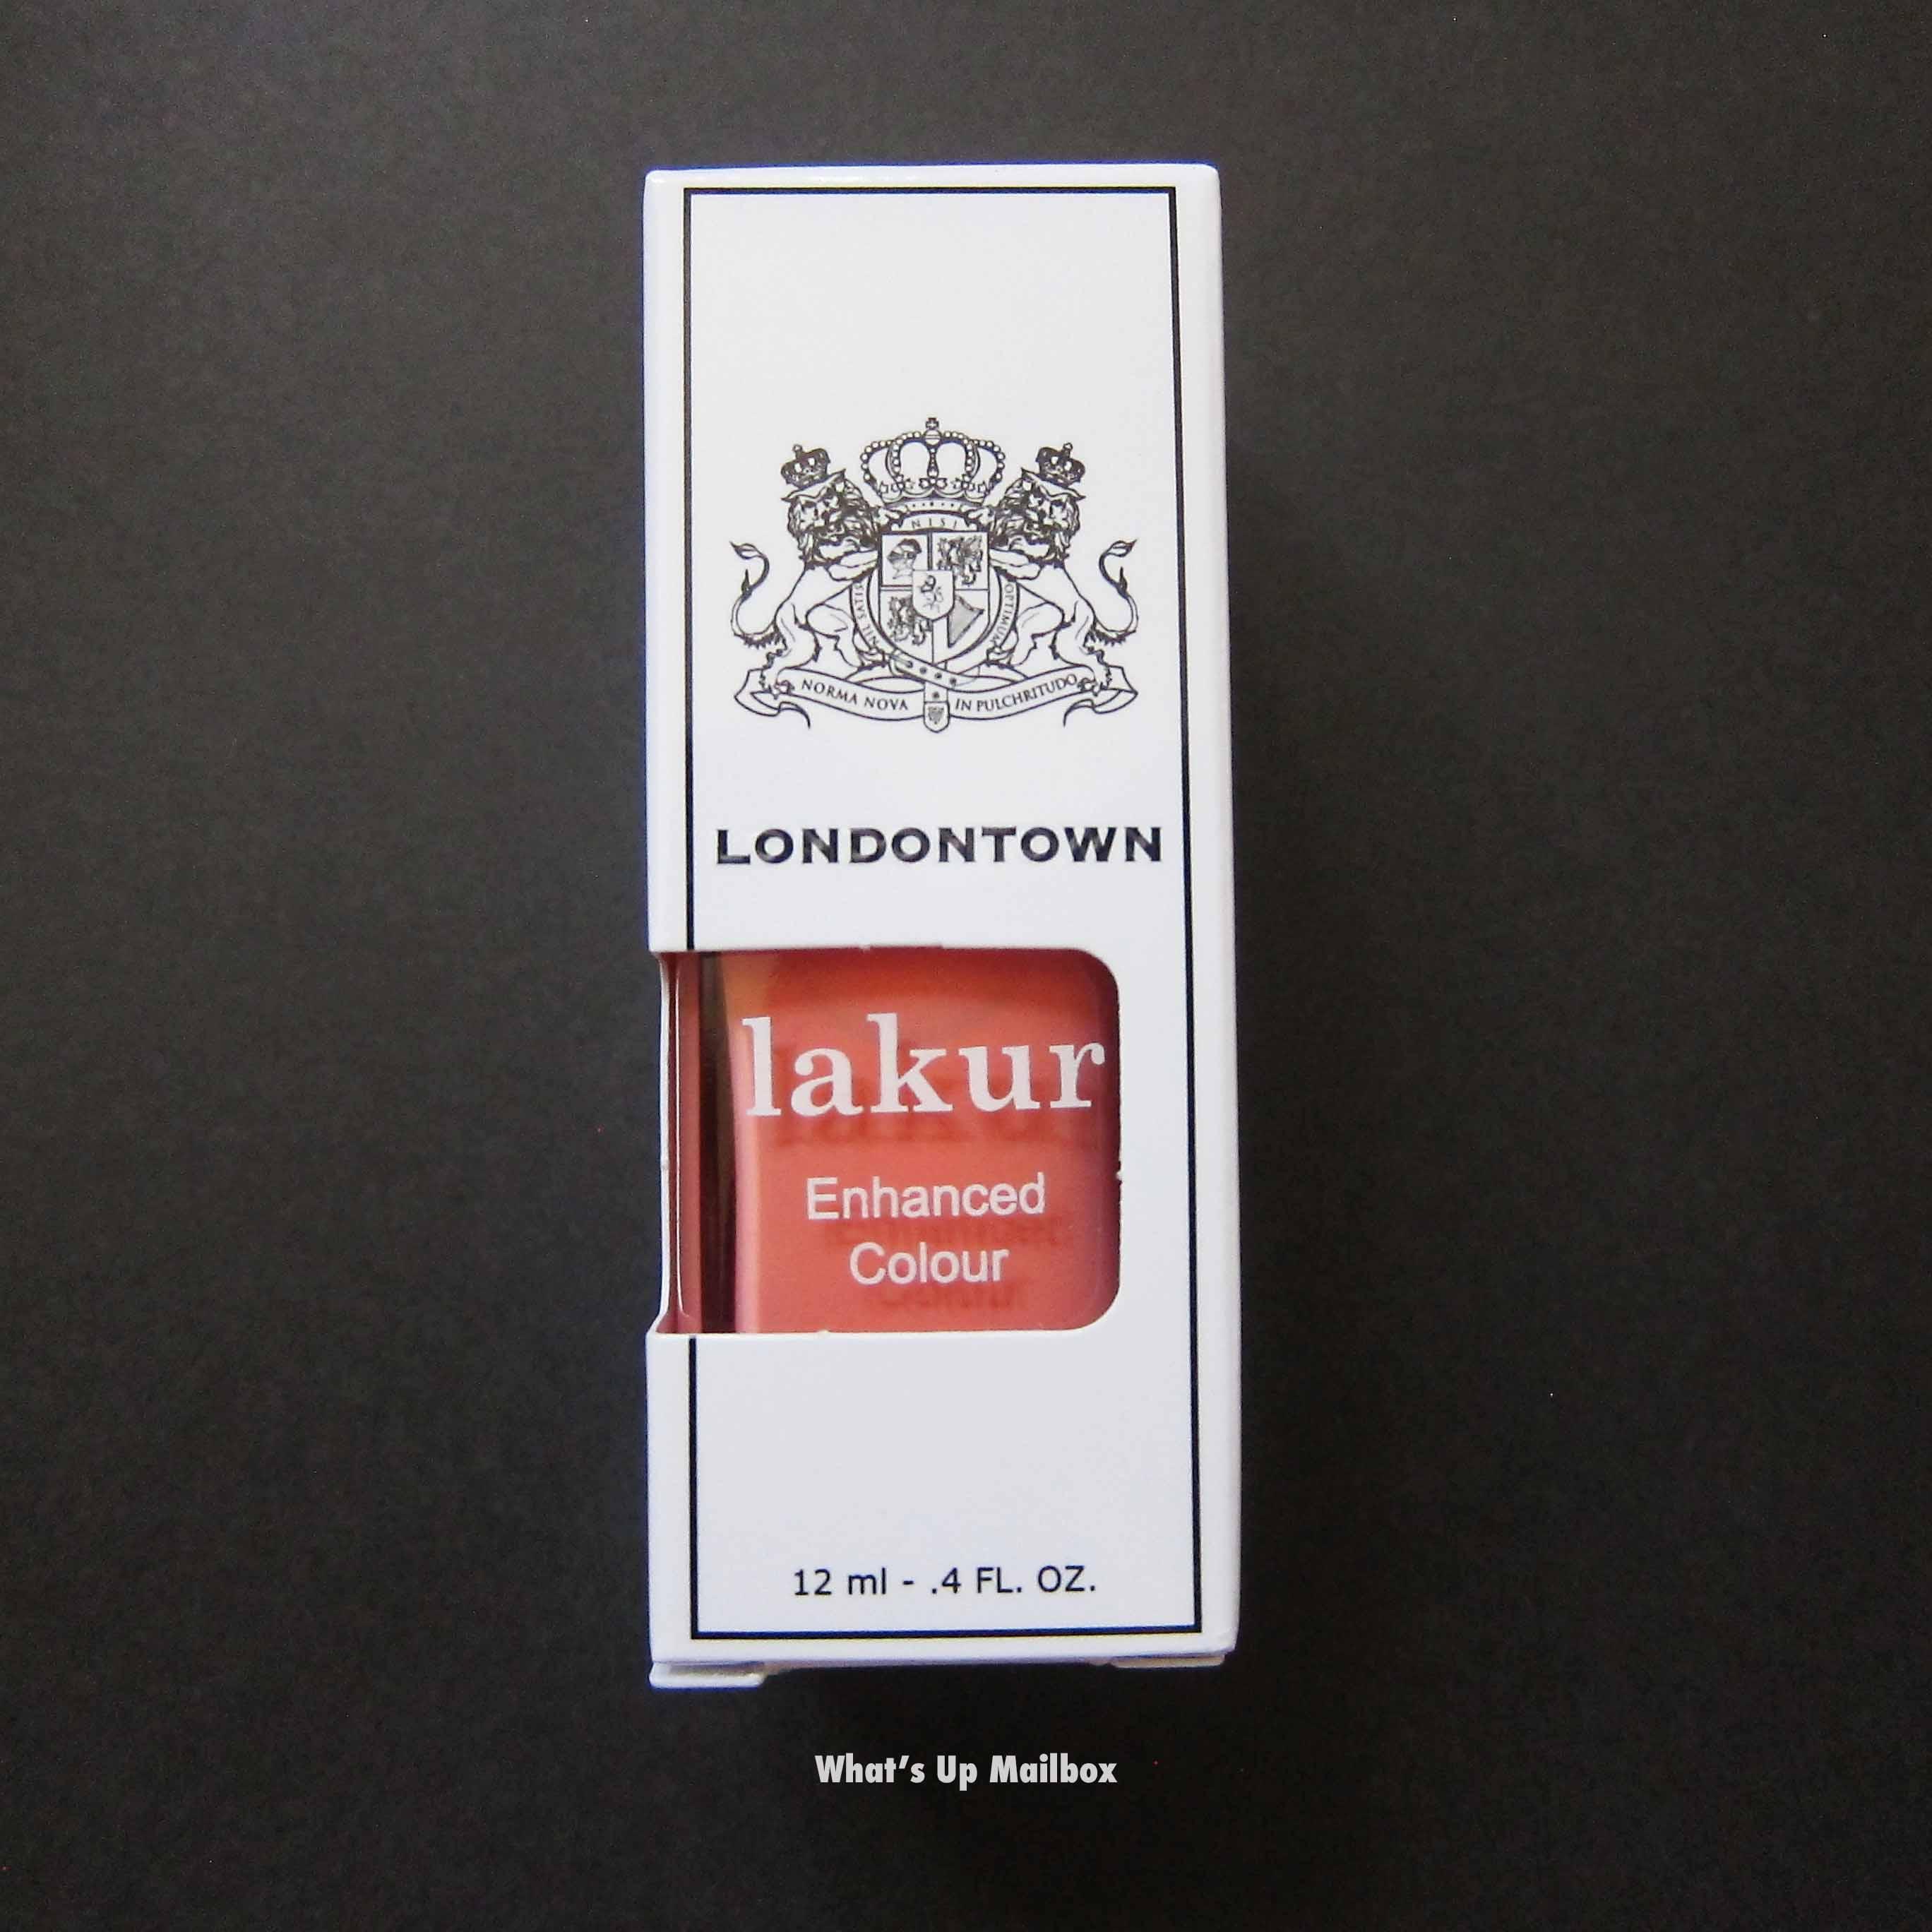 LondonTown Lakur Nail Polish